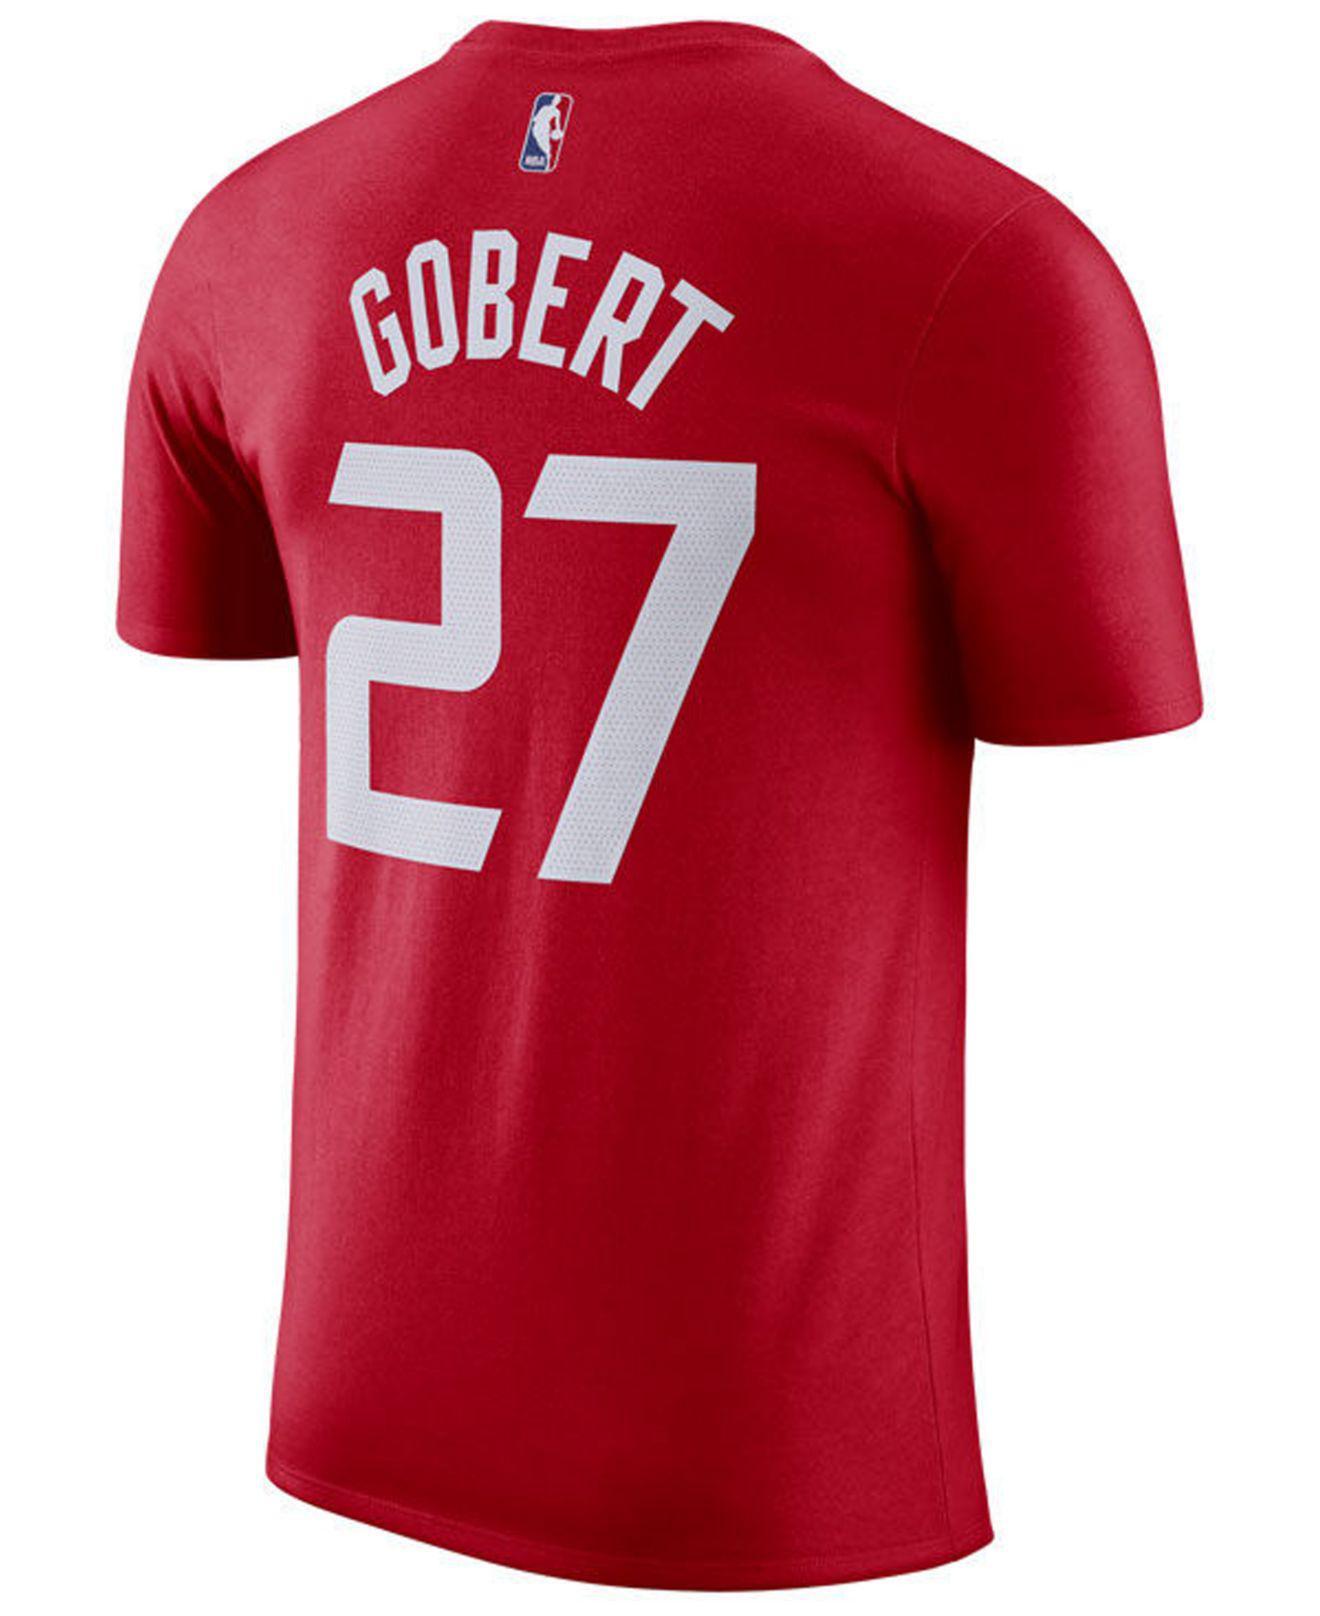 f4bfe0021 Lyst - Nike Rudy Robert Utah Jazz City Player T-shirt 2018 in Red for Men